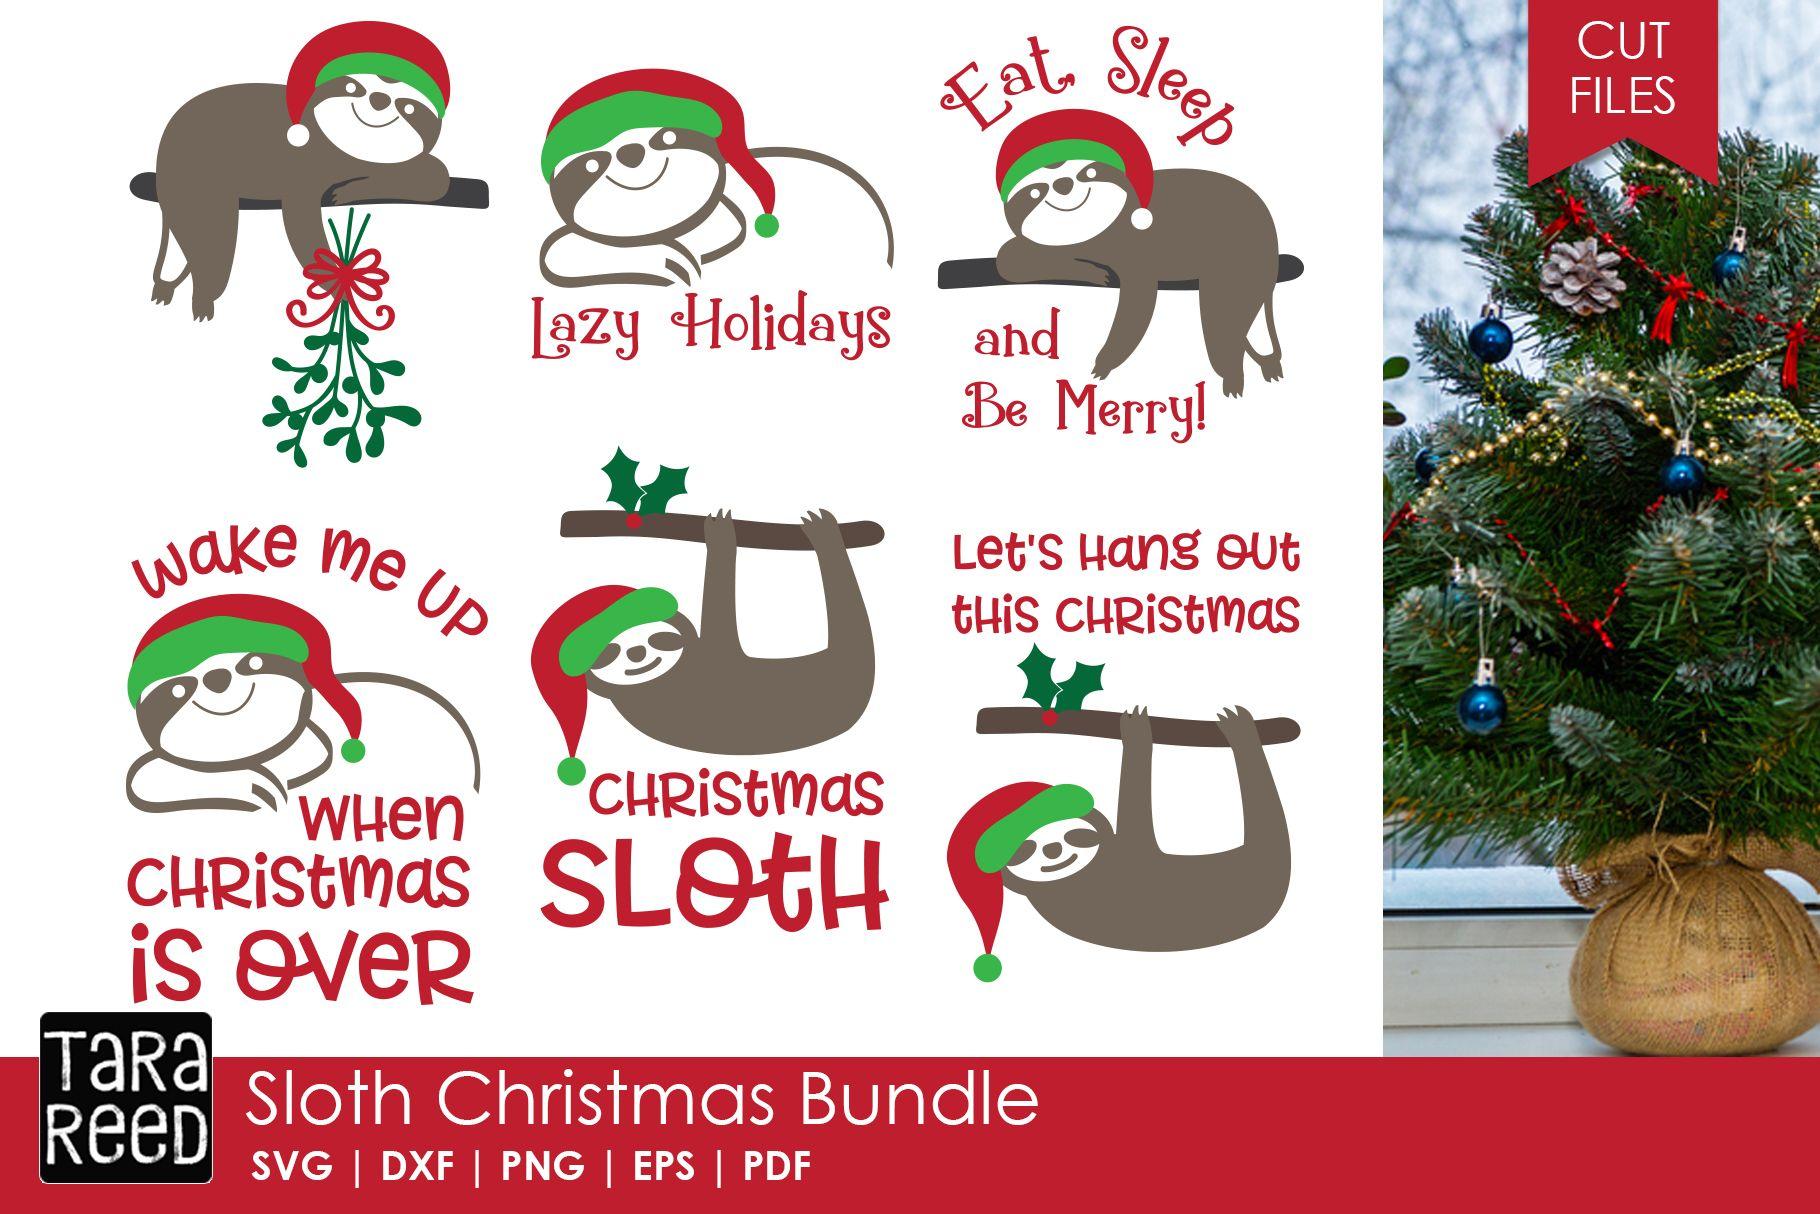 Sloth Christmas Christmas SVG Files for Crafters